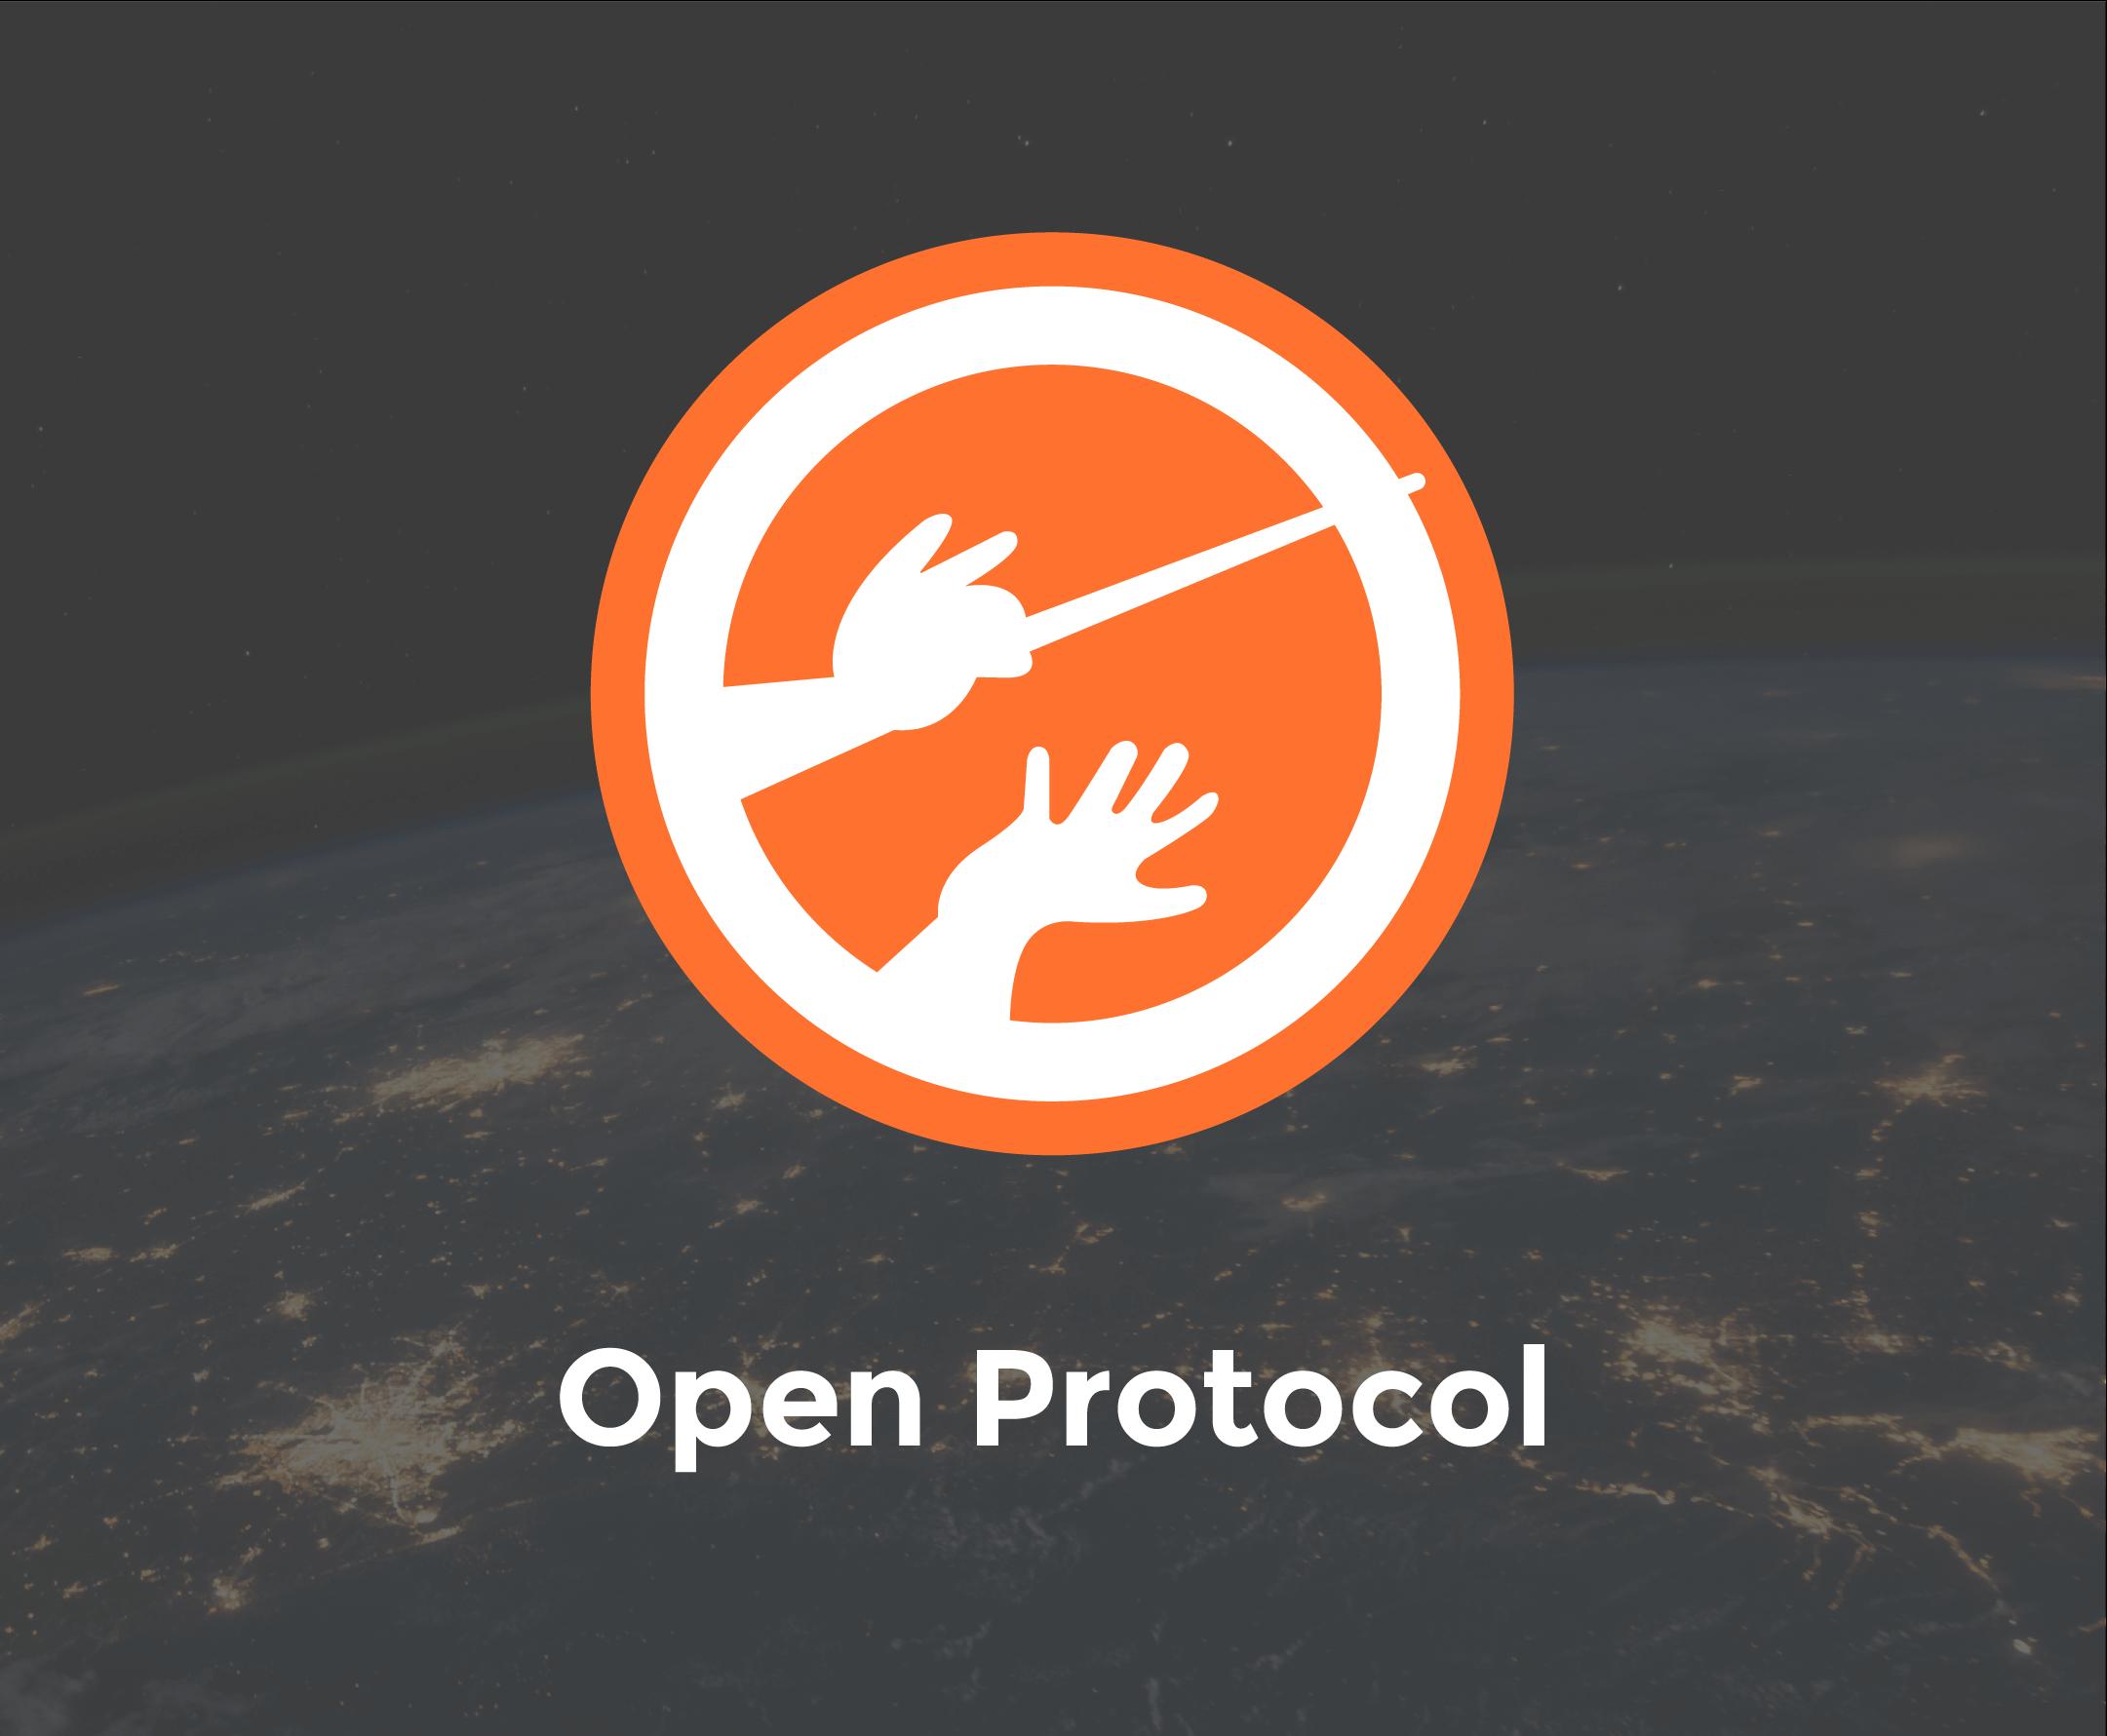 Open Protocol